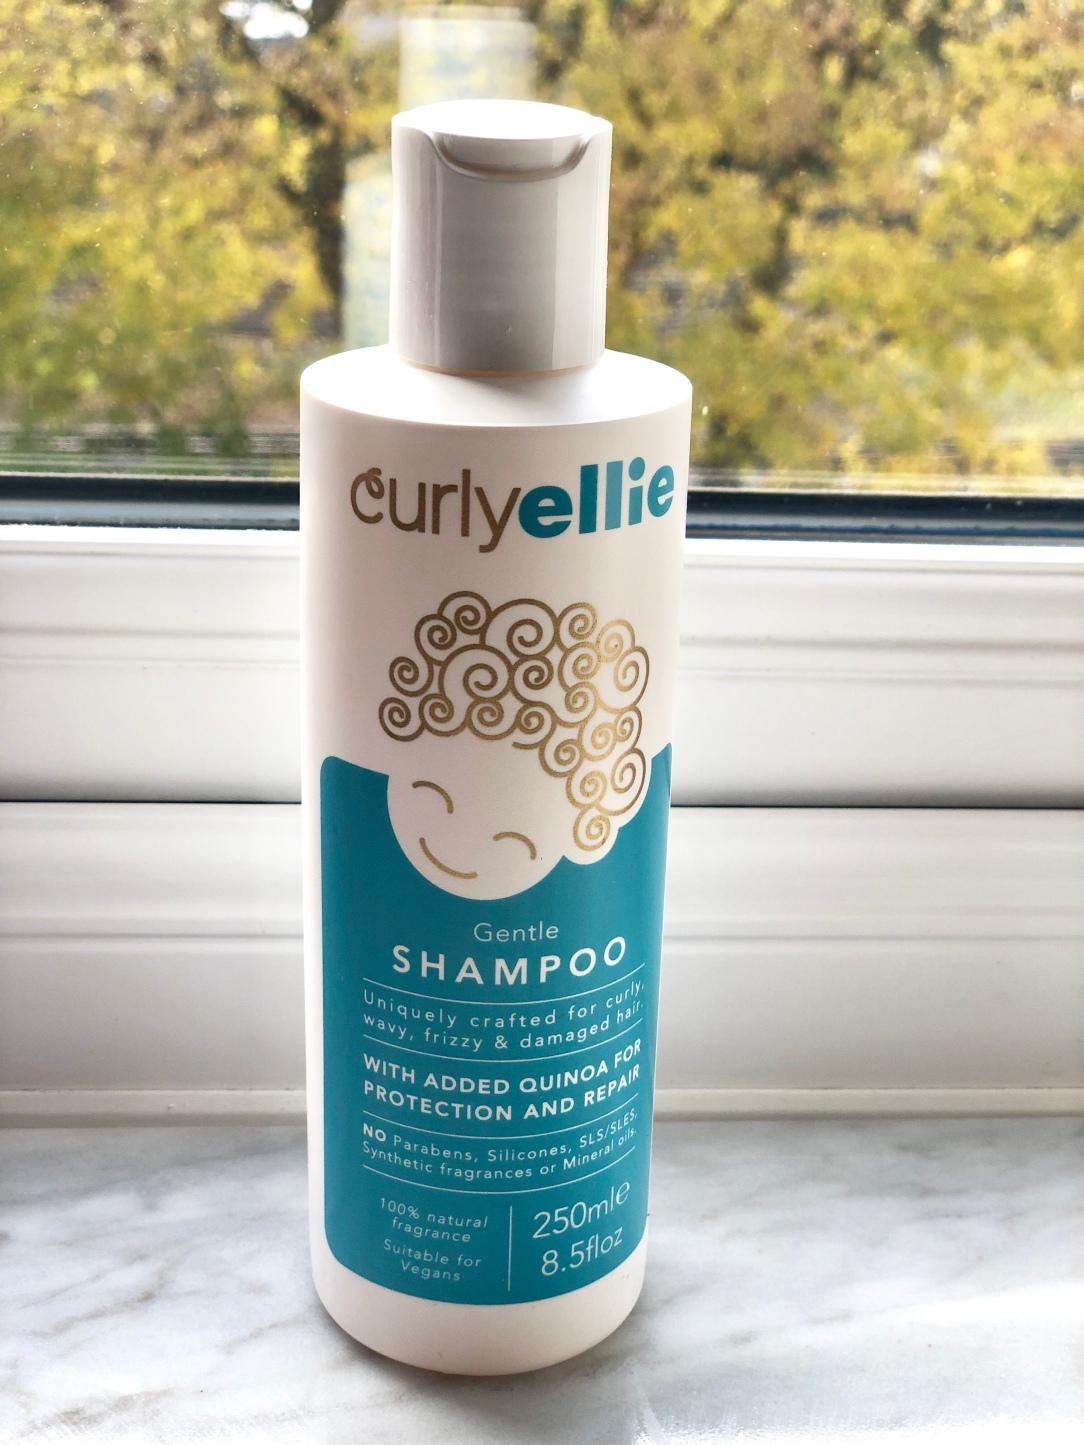 Curlyellie gentle shampoo